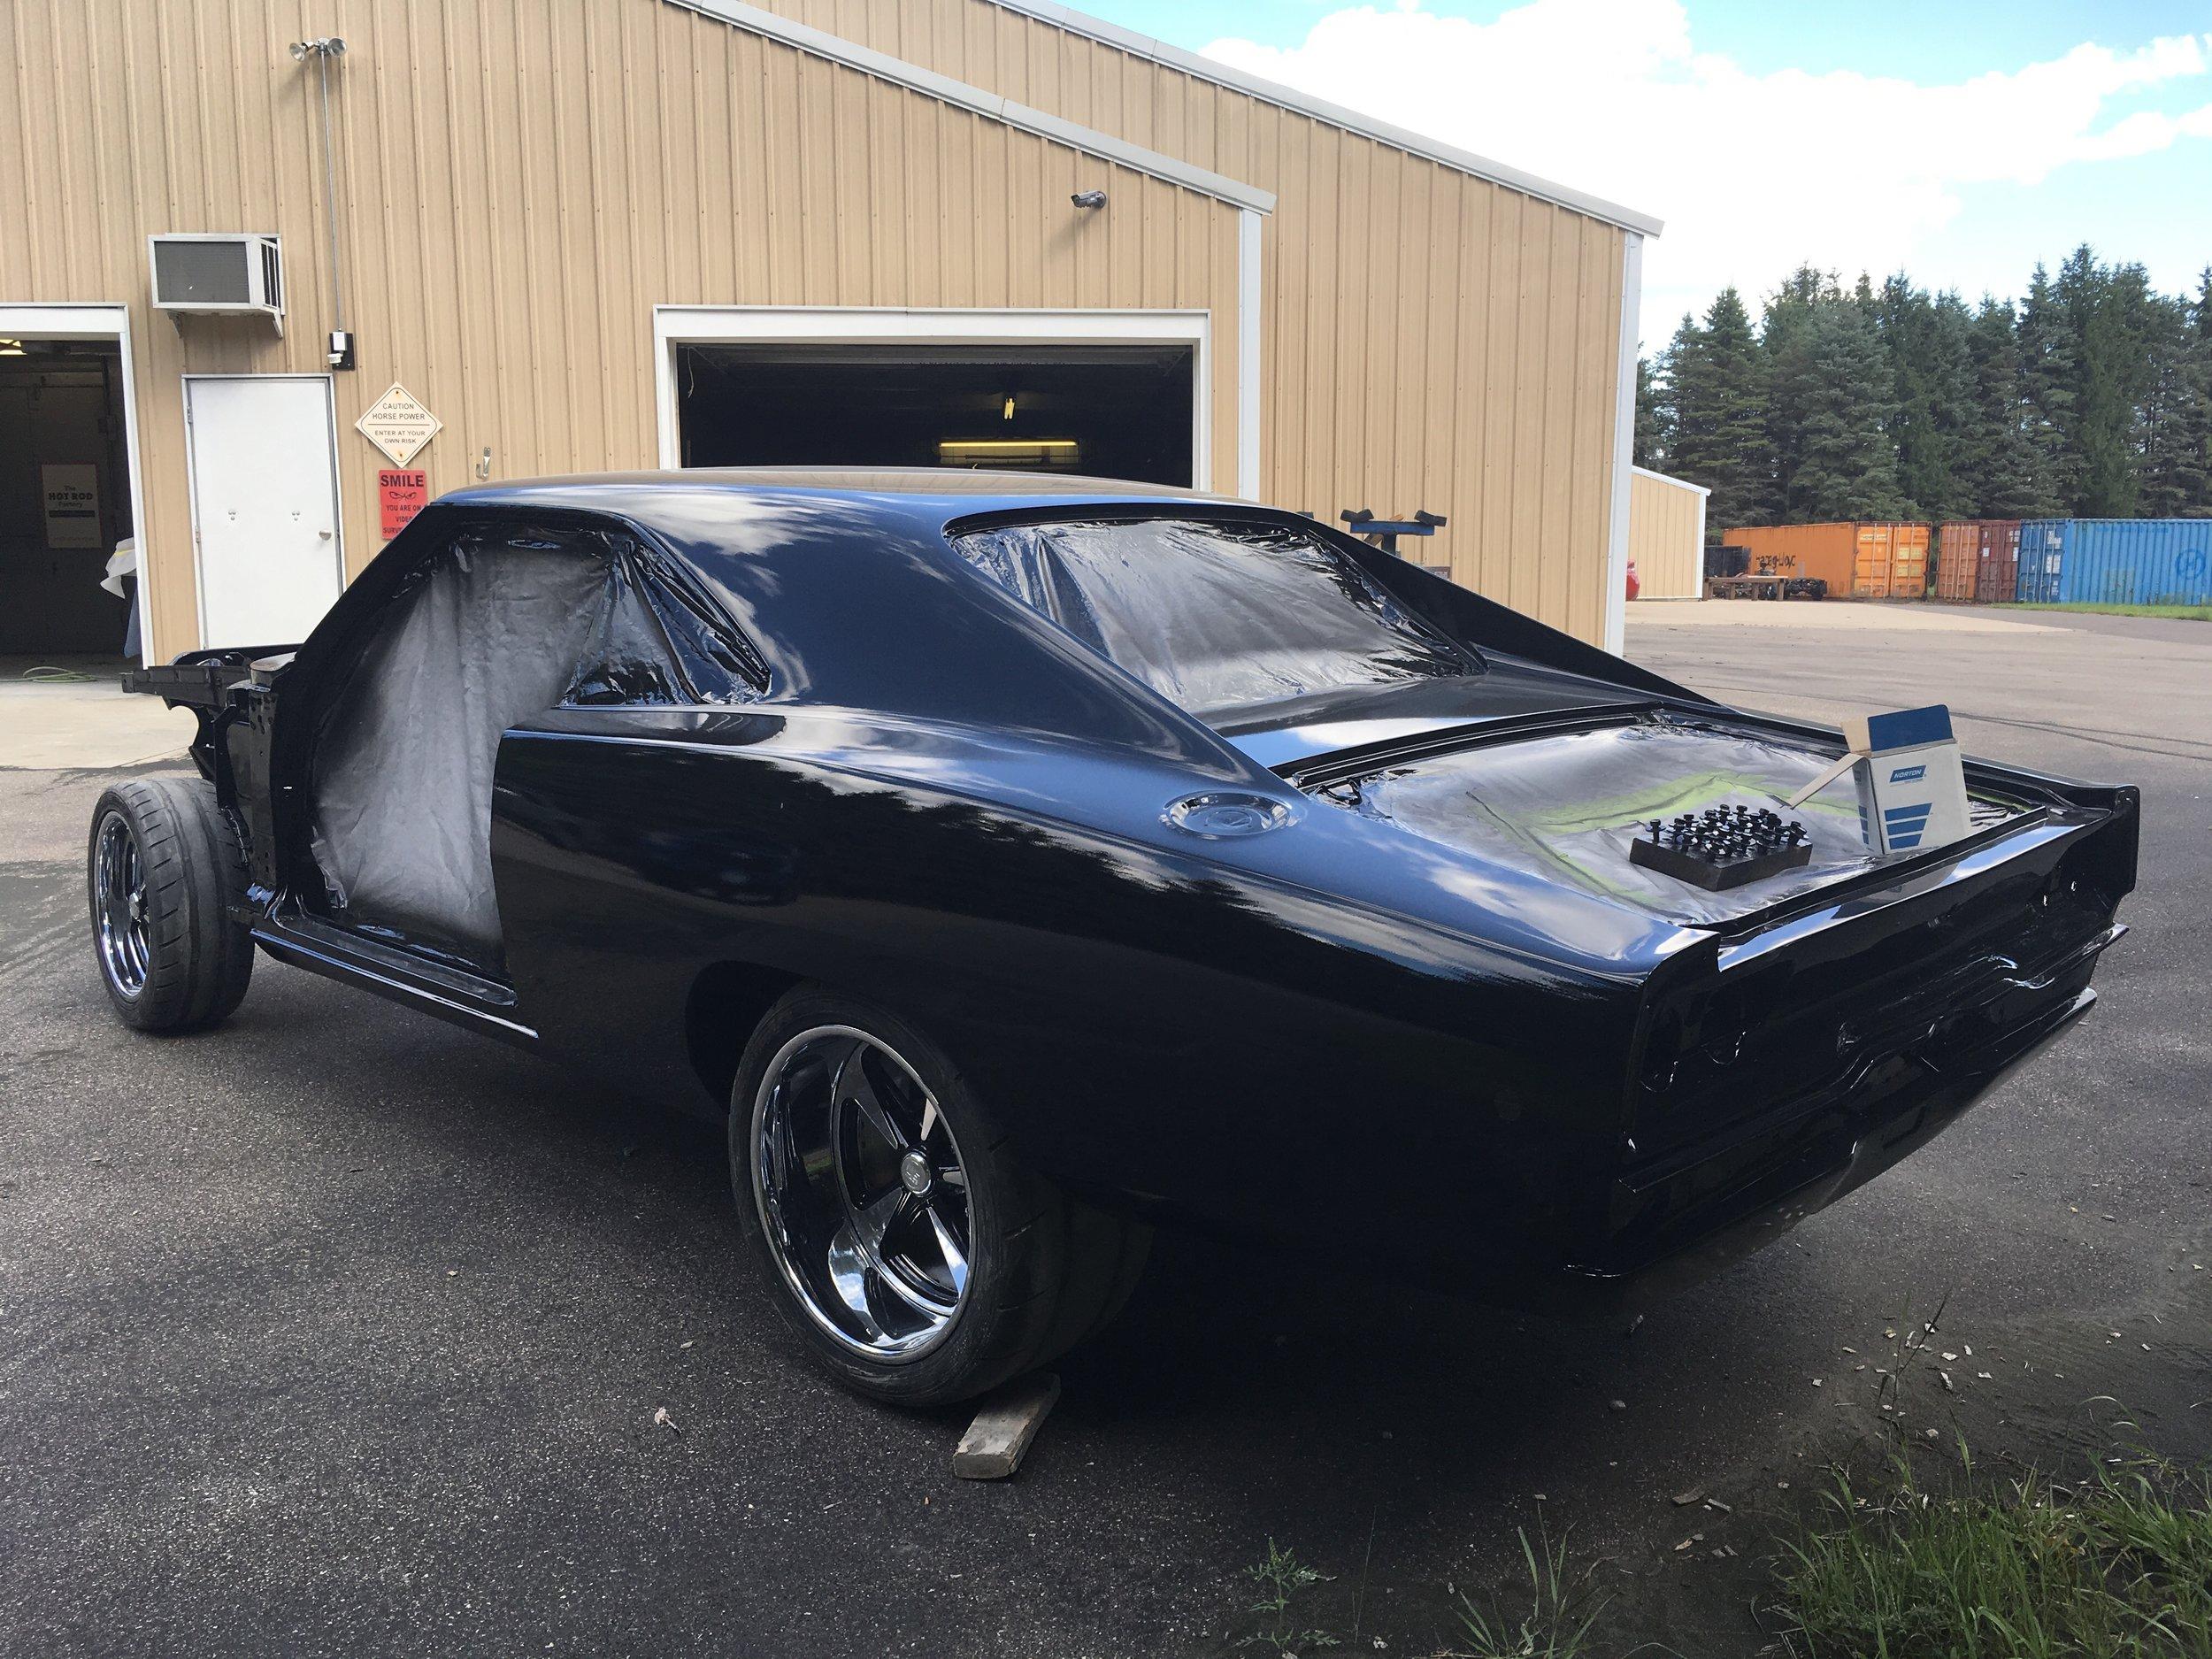 1968-Hell-Cat-Charger-minneapolis-hot-rod-custom-build-restoration-new-paint-black.jpg